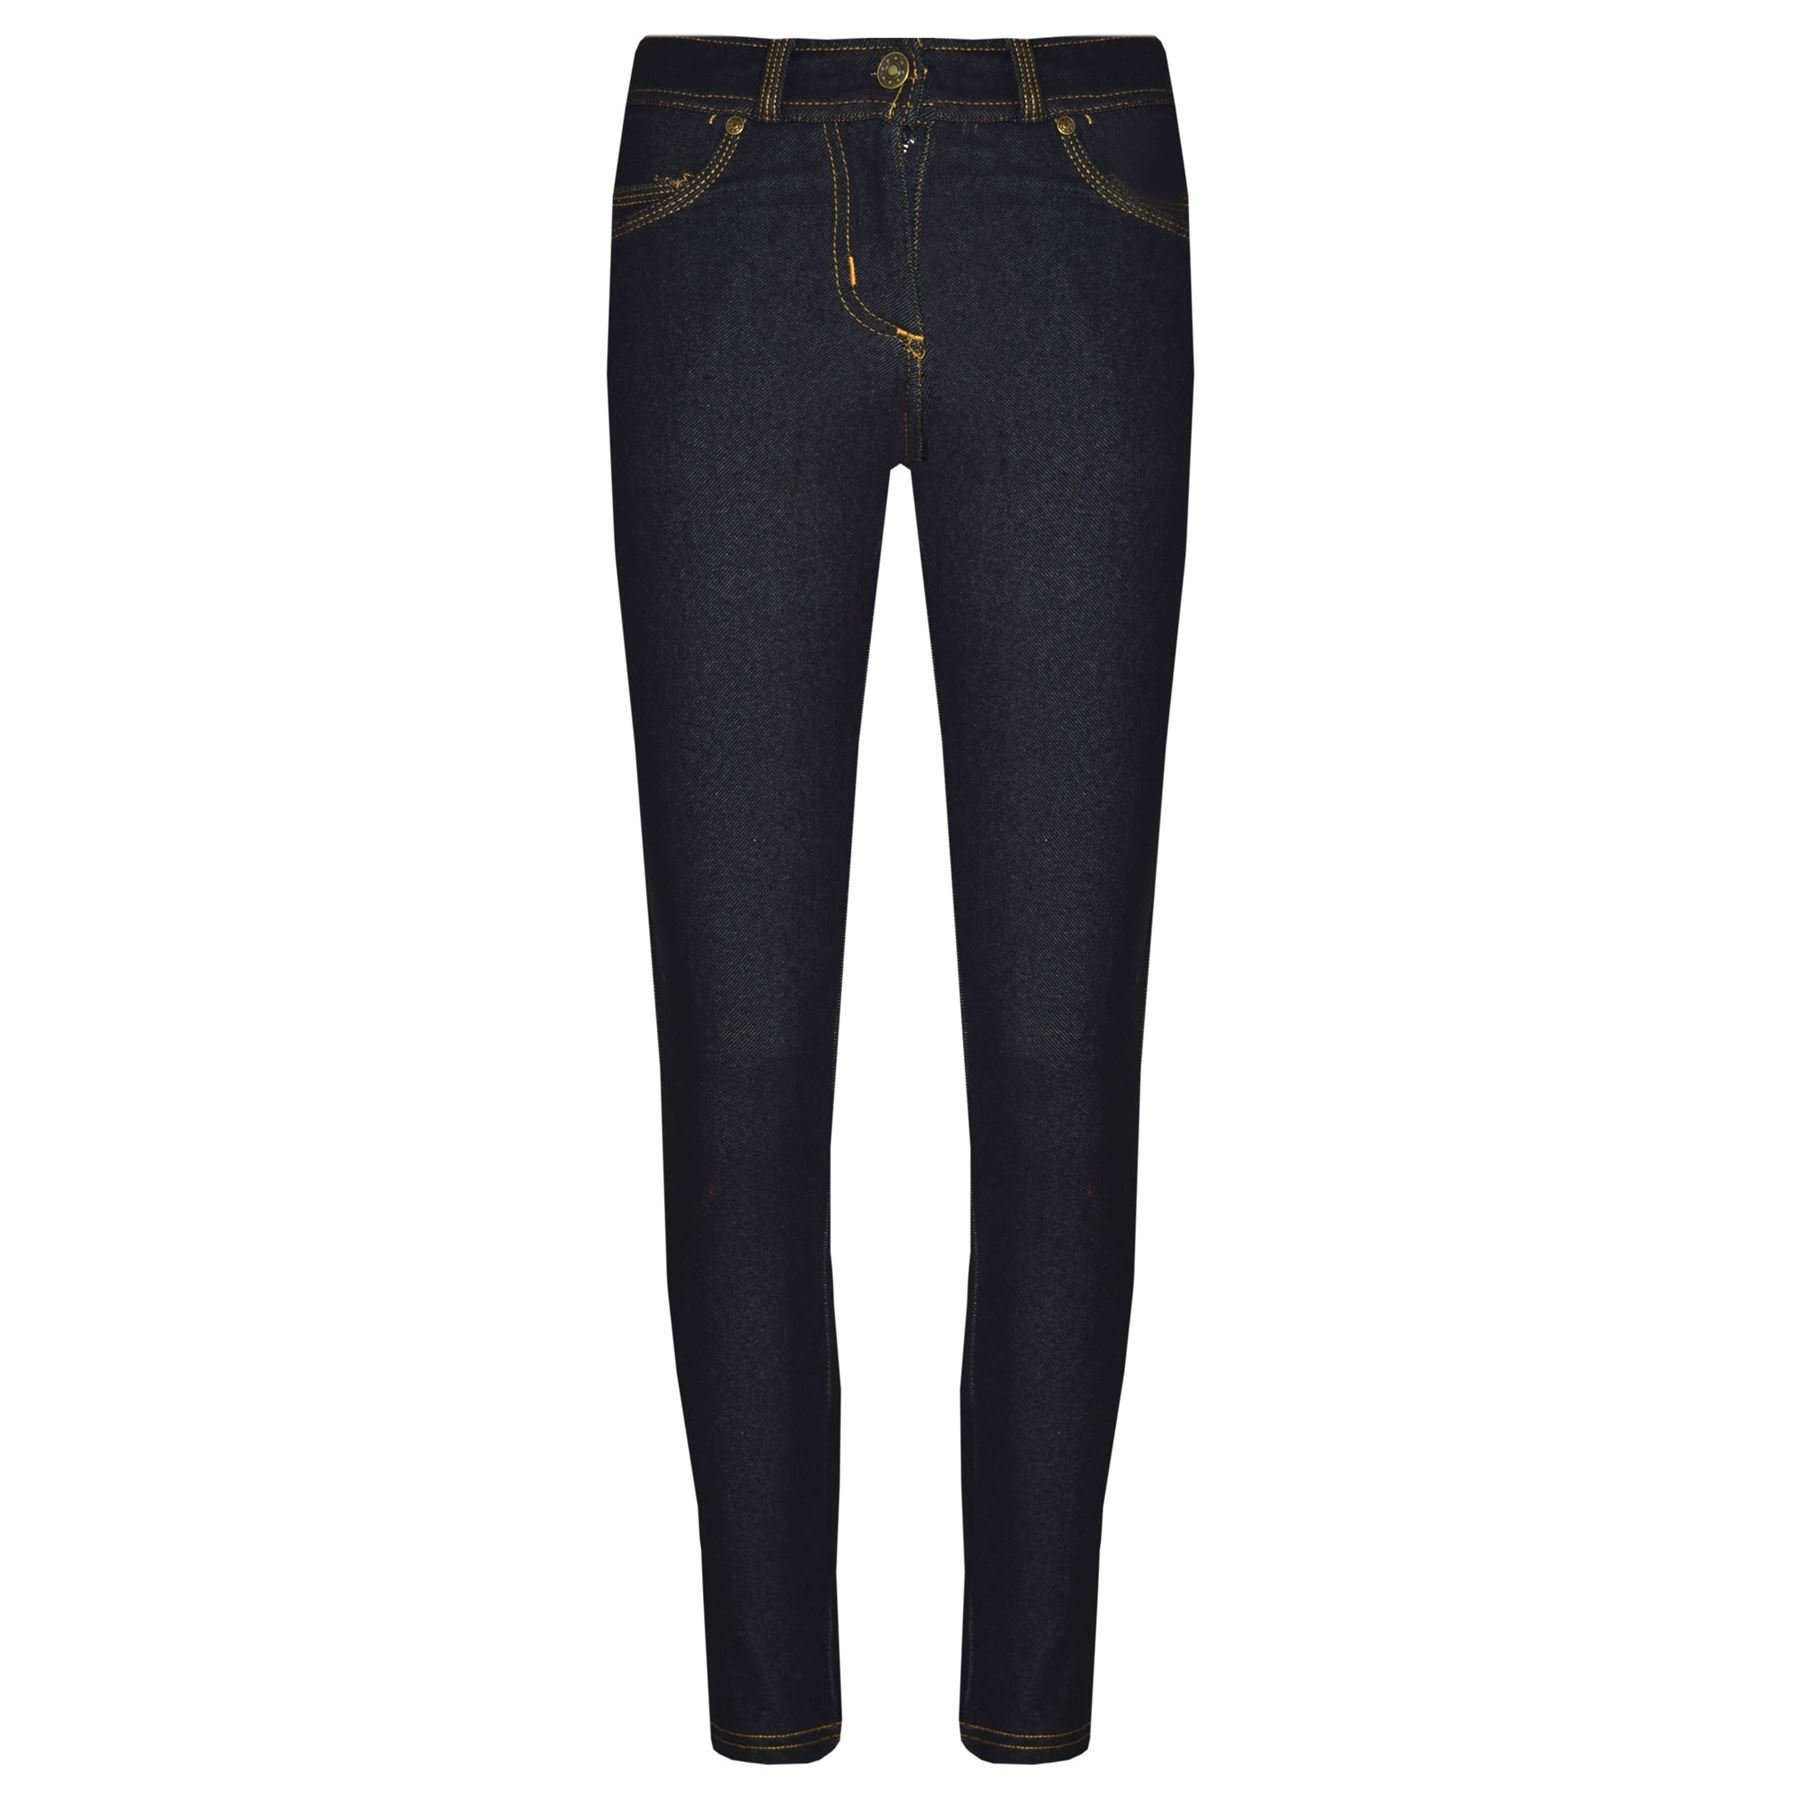 b7901197422 A2Z 4 Kids® Girls Skinny Jeans Kids Black Stretchy Denim Jeggings Fit Pants  Trousers 5-13 Yr